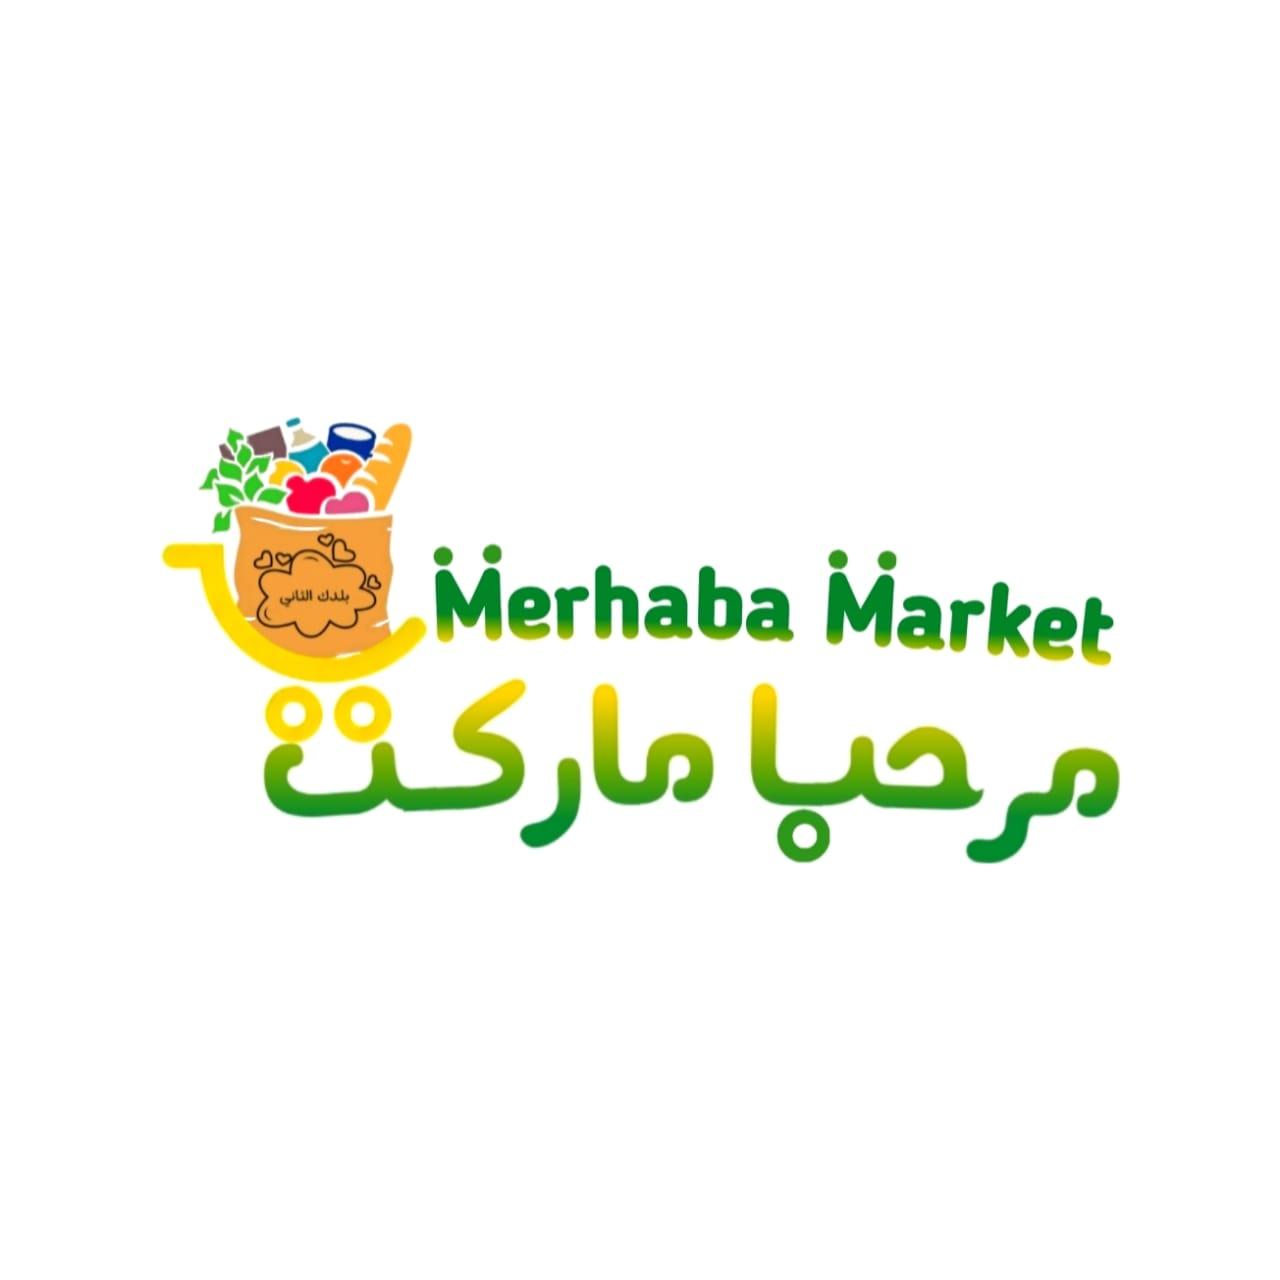 Merhaba Market Logo